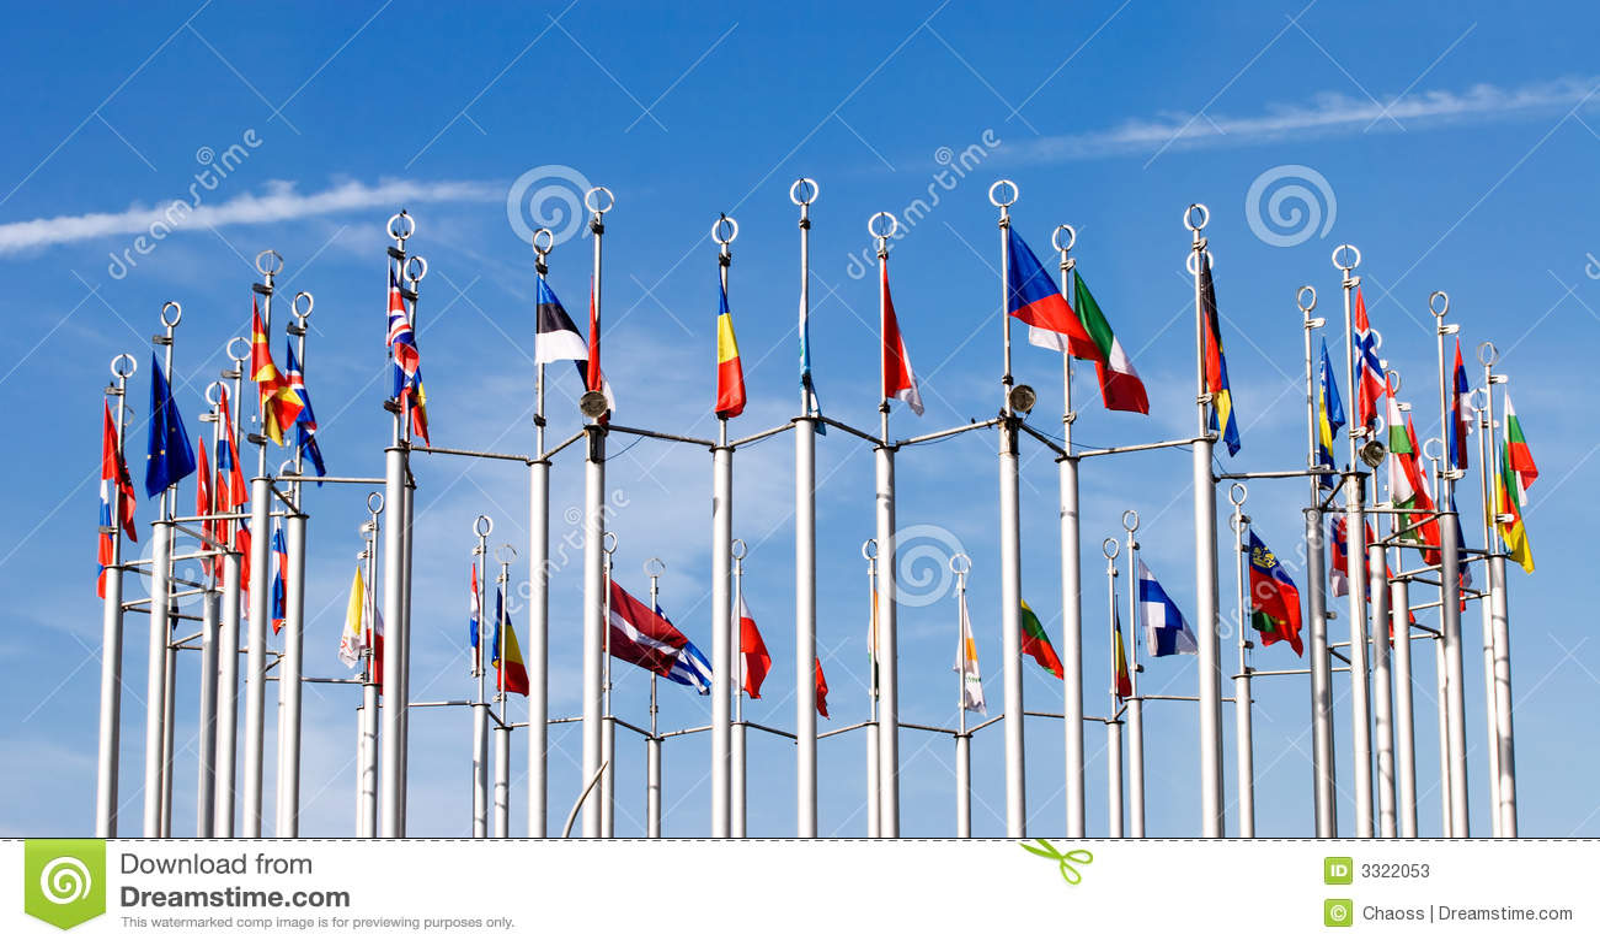 Bandeiras no fundo do céu azul